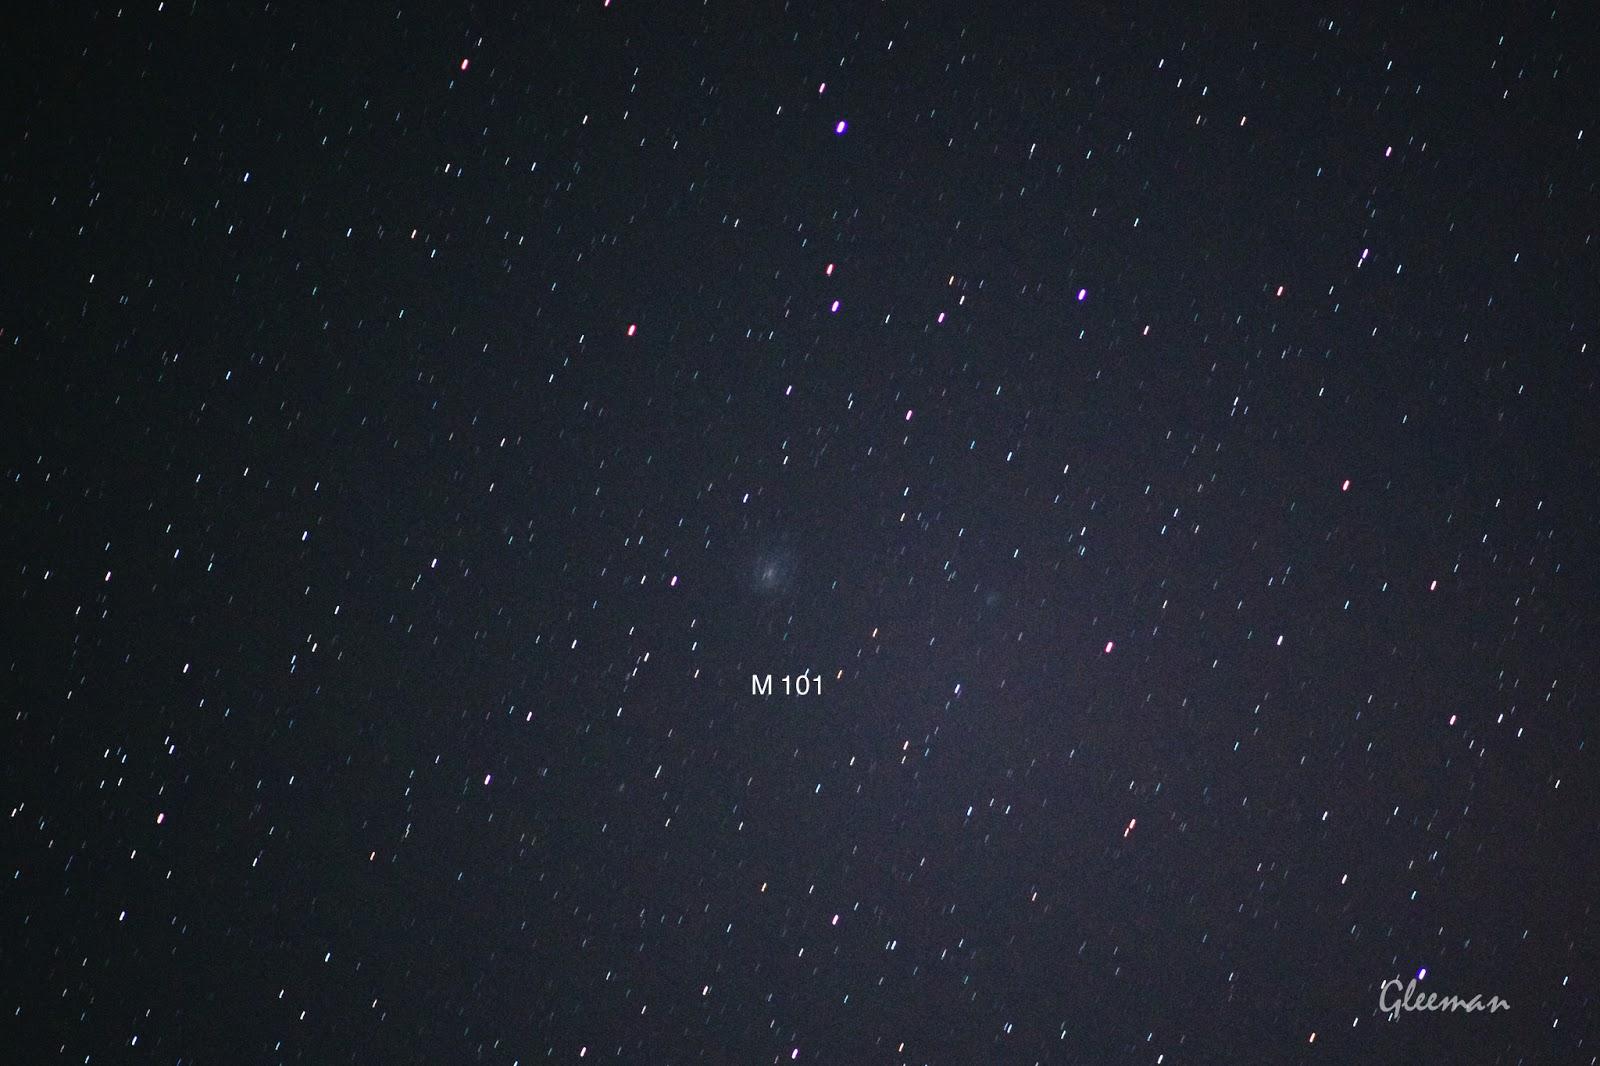 M101/ Pentax  K5 + Pentax O-GPS1 + DA*200